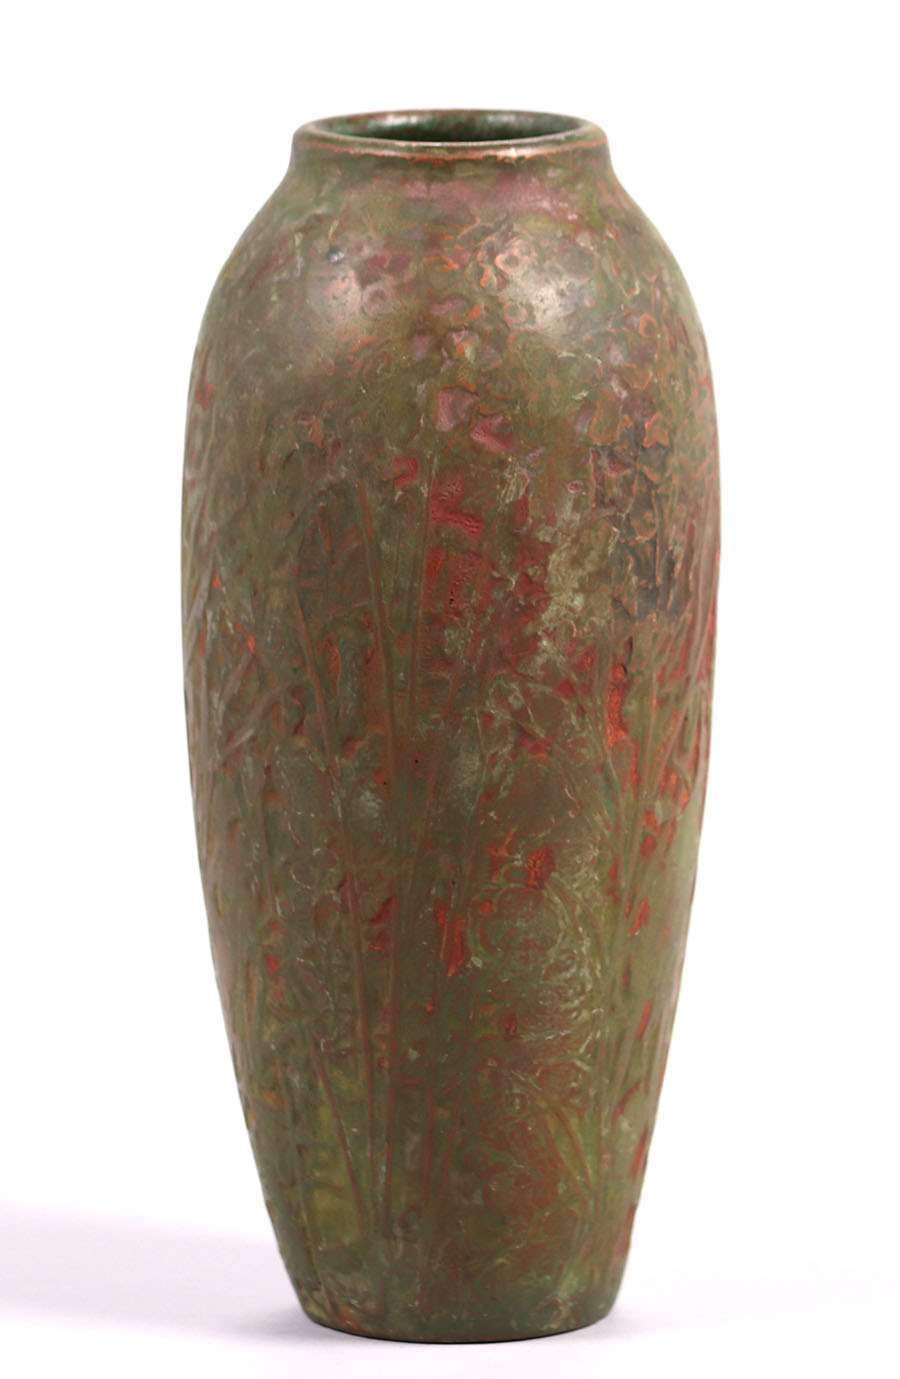 Markham Pottery Vase Ann Arbor Mi C1908 1910 California Historical Design